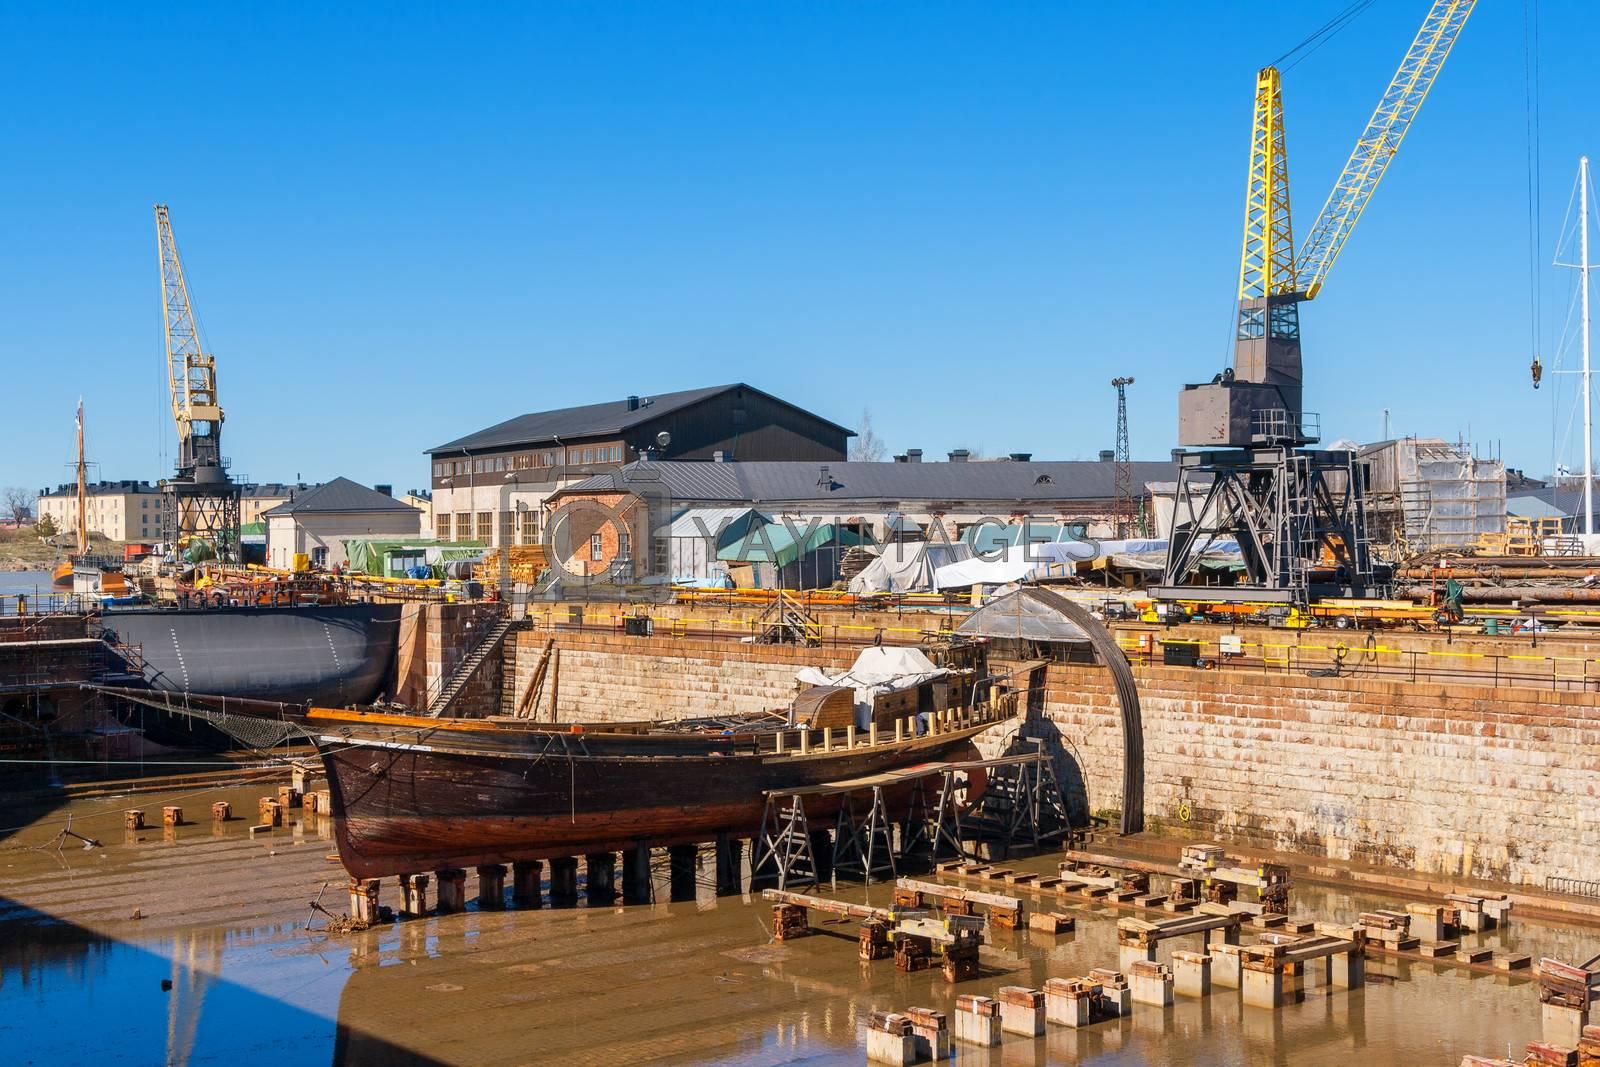 Dry dock at Suomenlinna maritime fortress. Helsinki, Finland